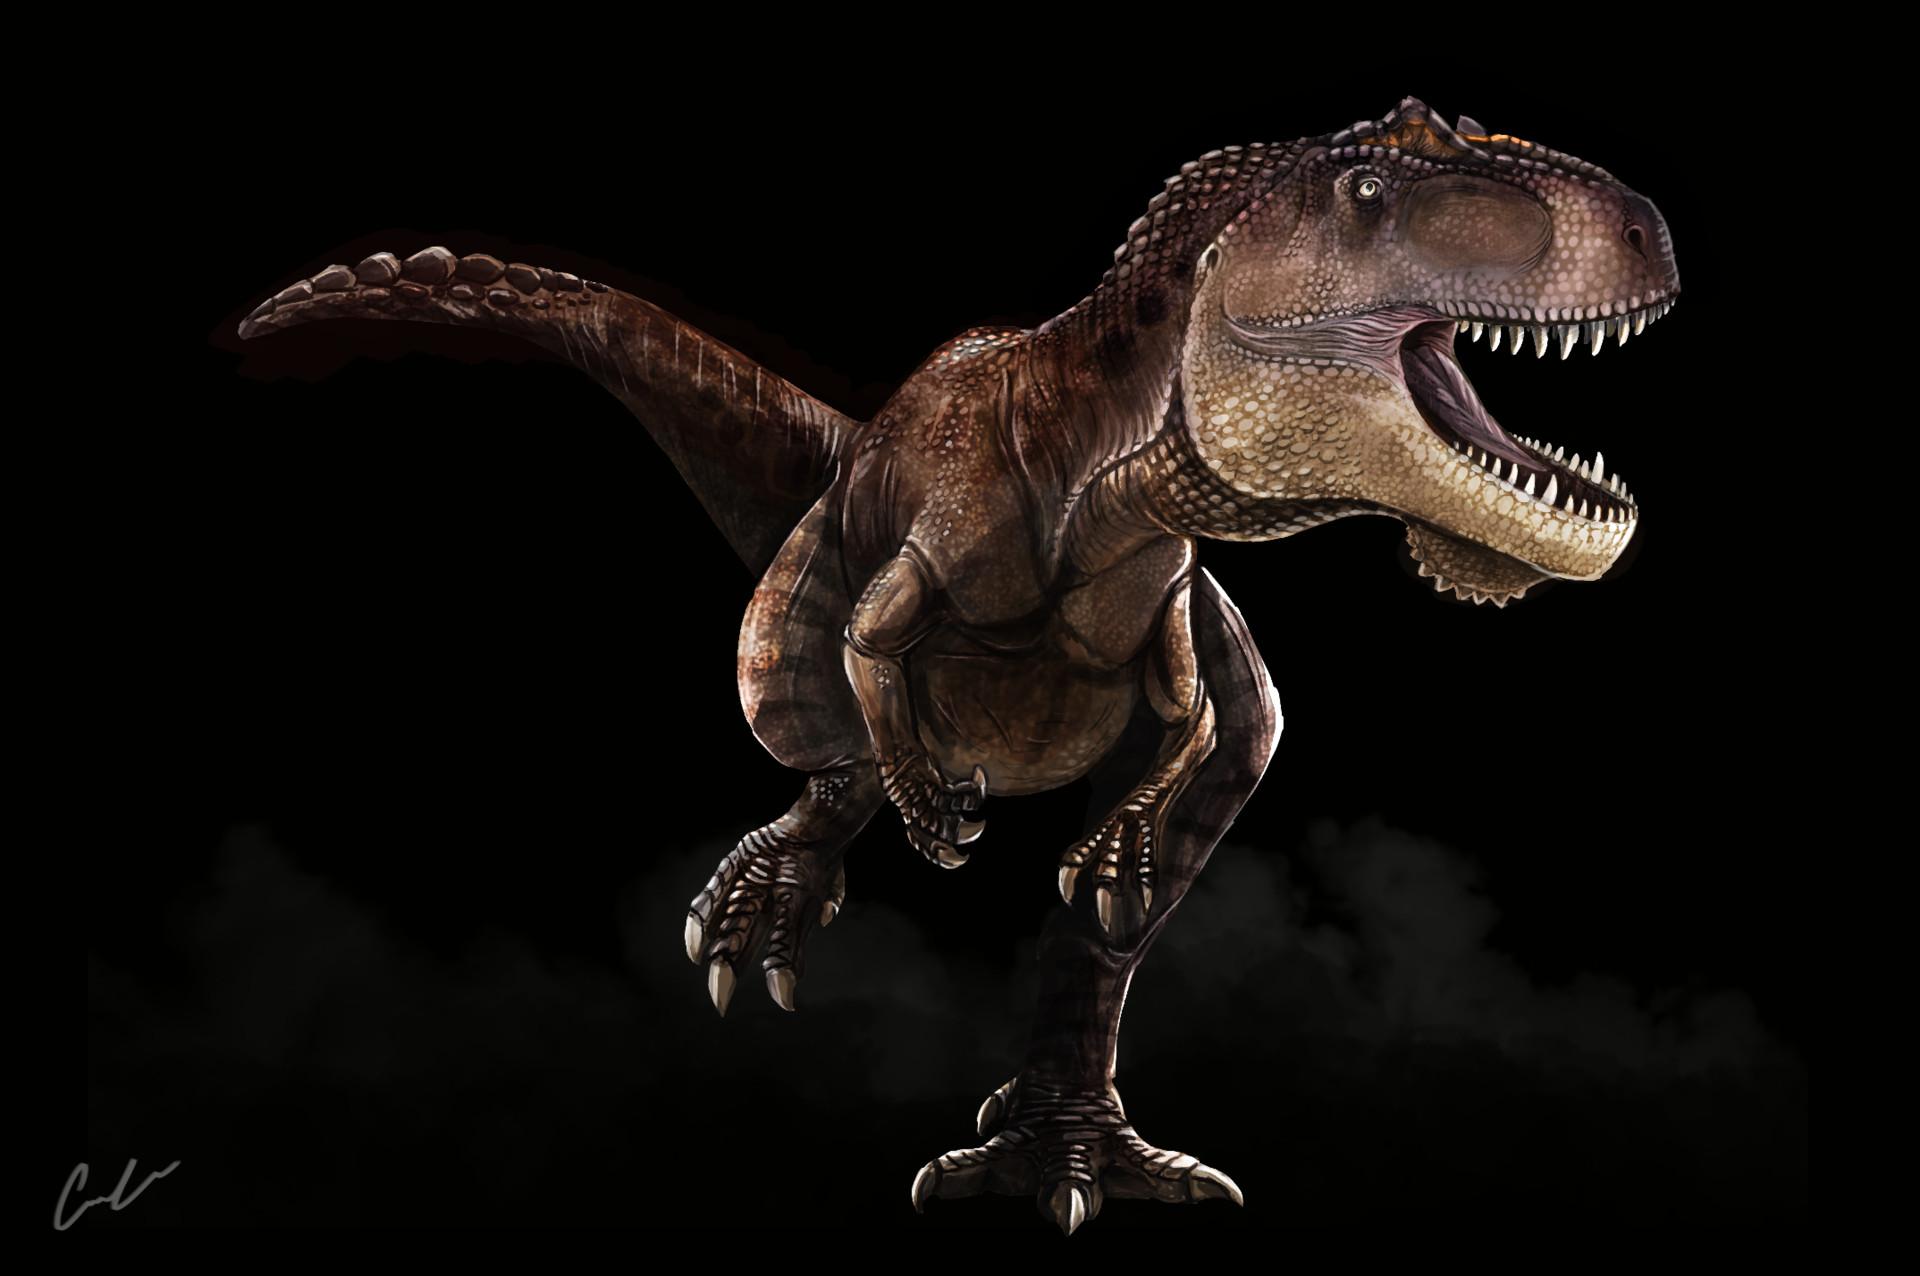 Cameron clow the isle giganotosaurus carolinii by triceratopsian daqkepp